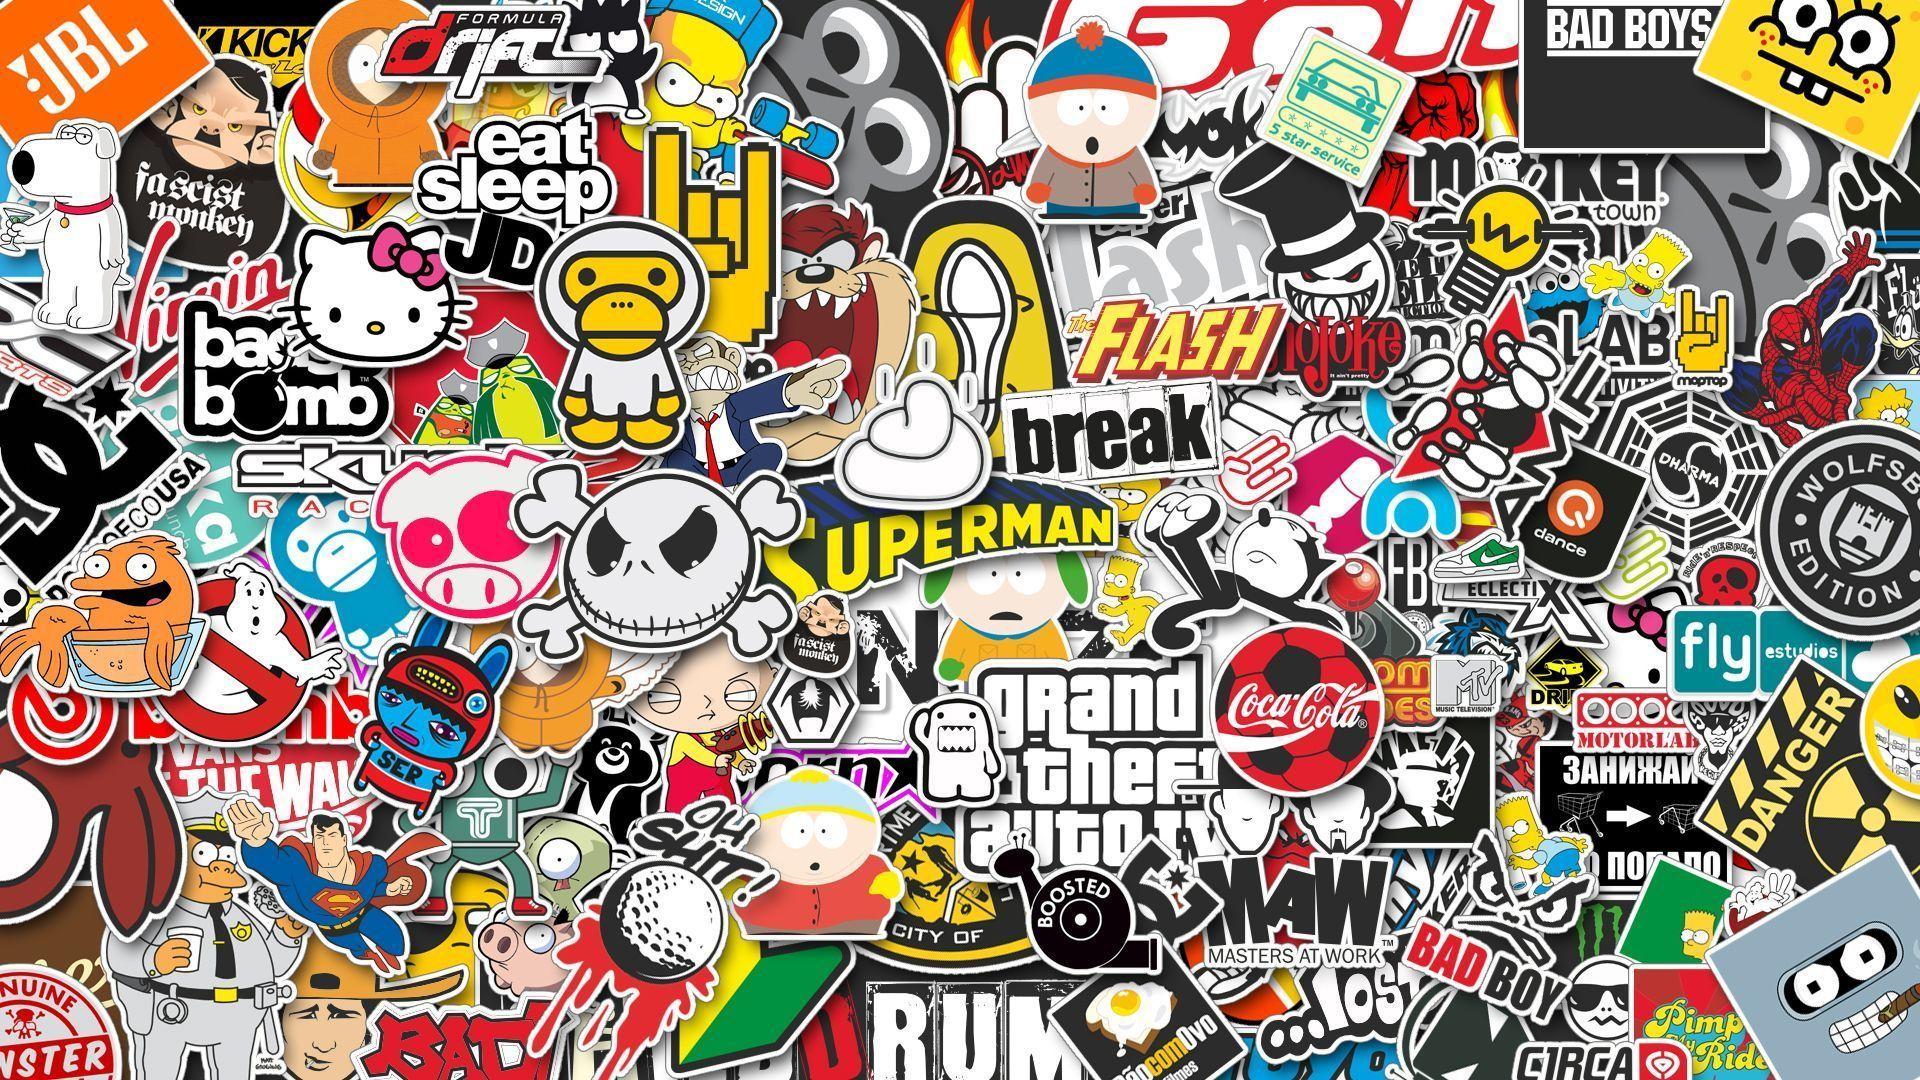 Download Wallpaper 1920x1080 Stickers, Style, Jdm Full HD